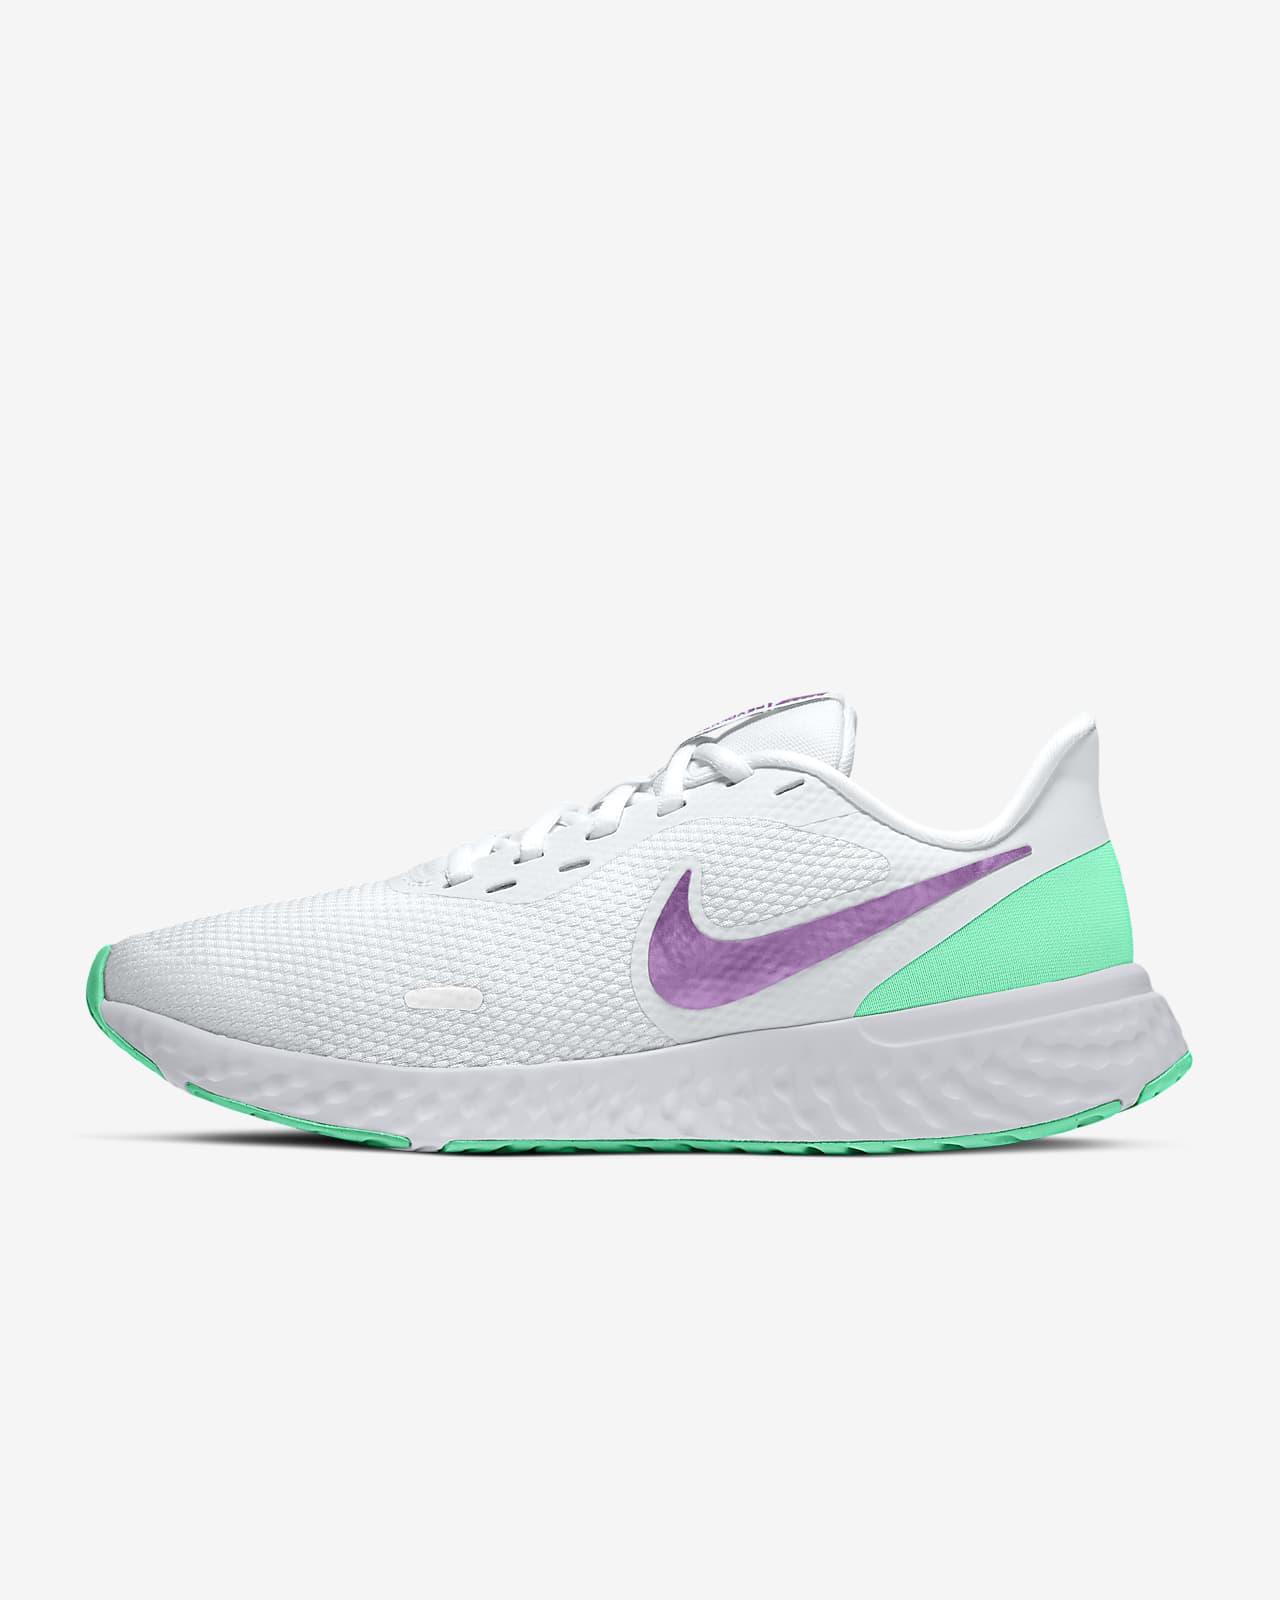 Calzado de running para mujer Nike Revolution 5